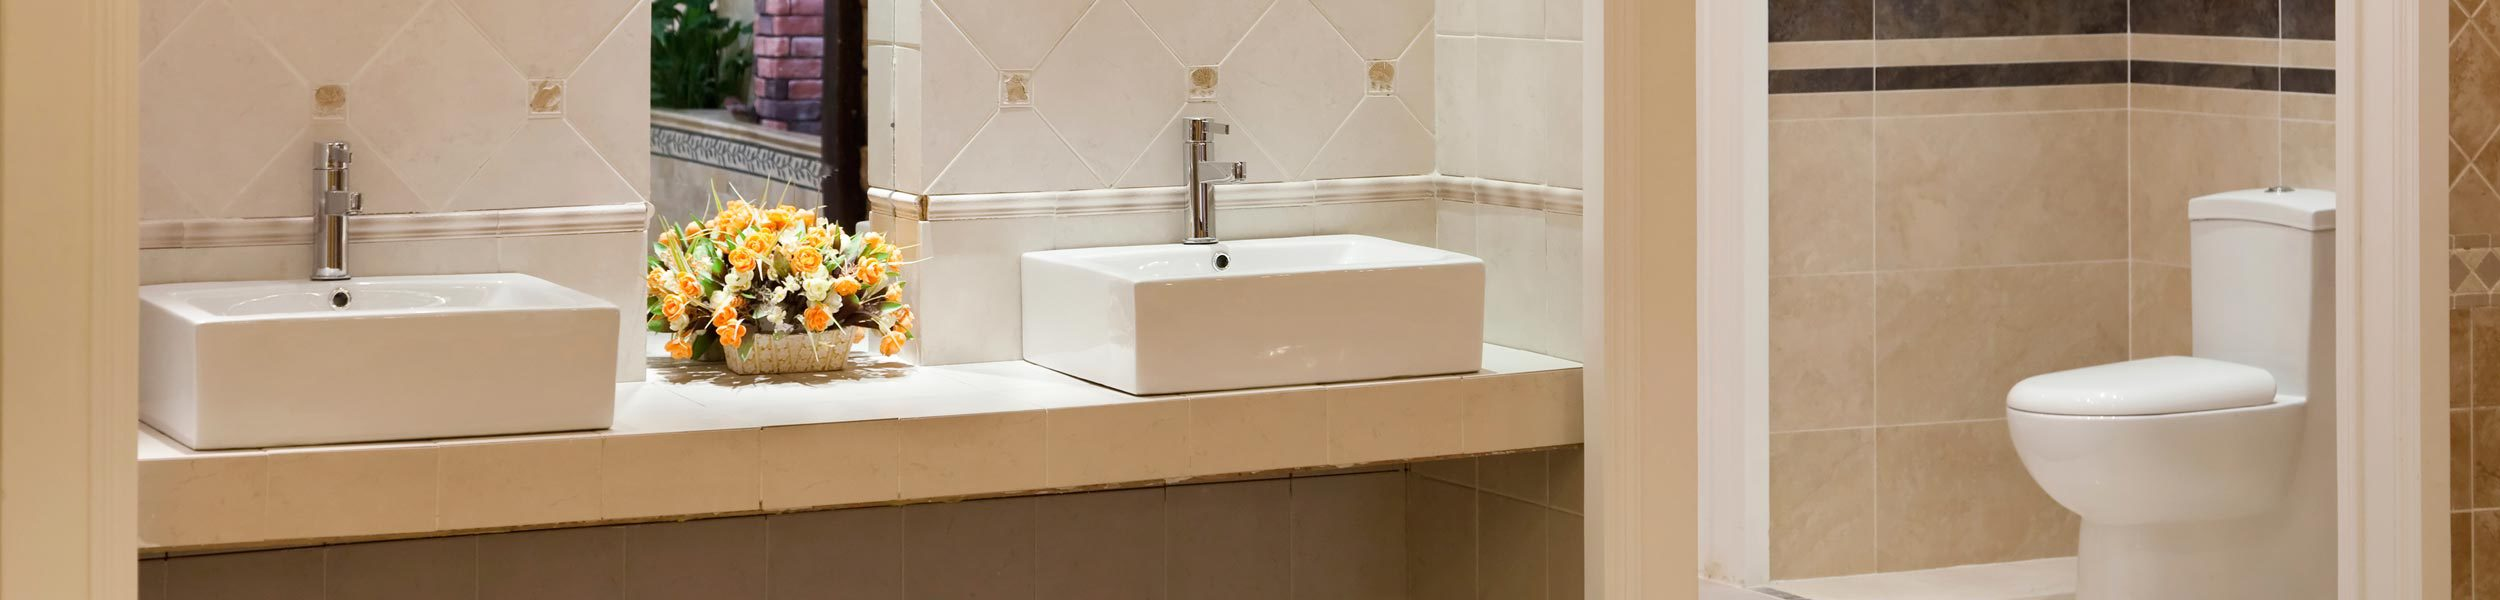 affordable bathrooms. affordable bathrooms in heckmondwike e